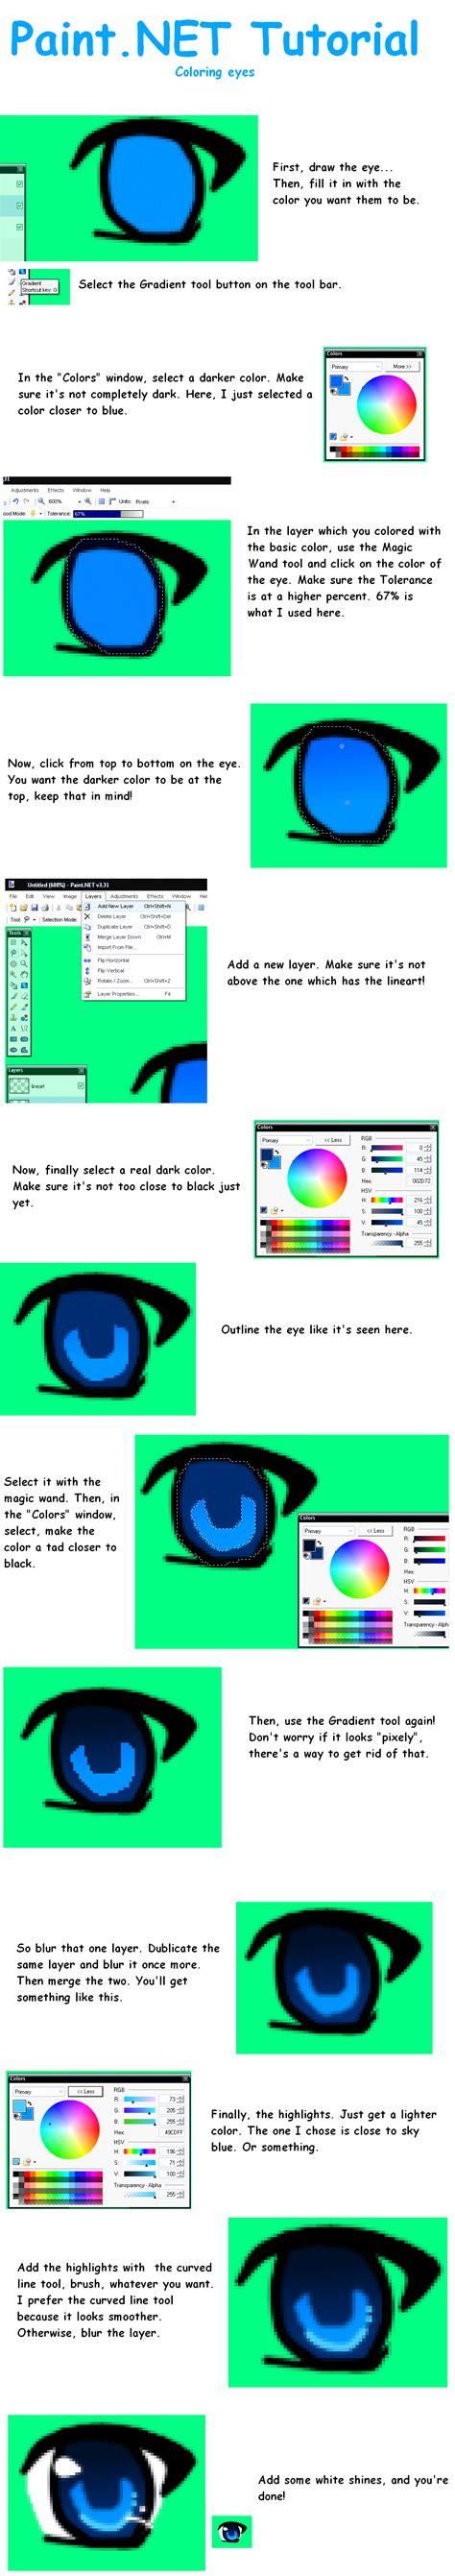 make pattern paint net paint net eye tutorial 2 by angelthehedgehog on deviantart